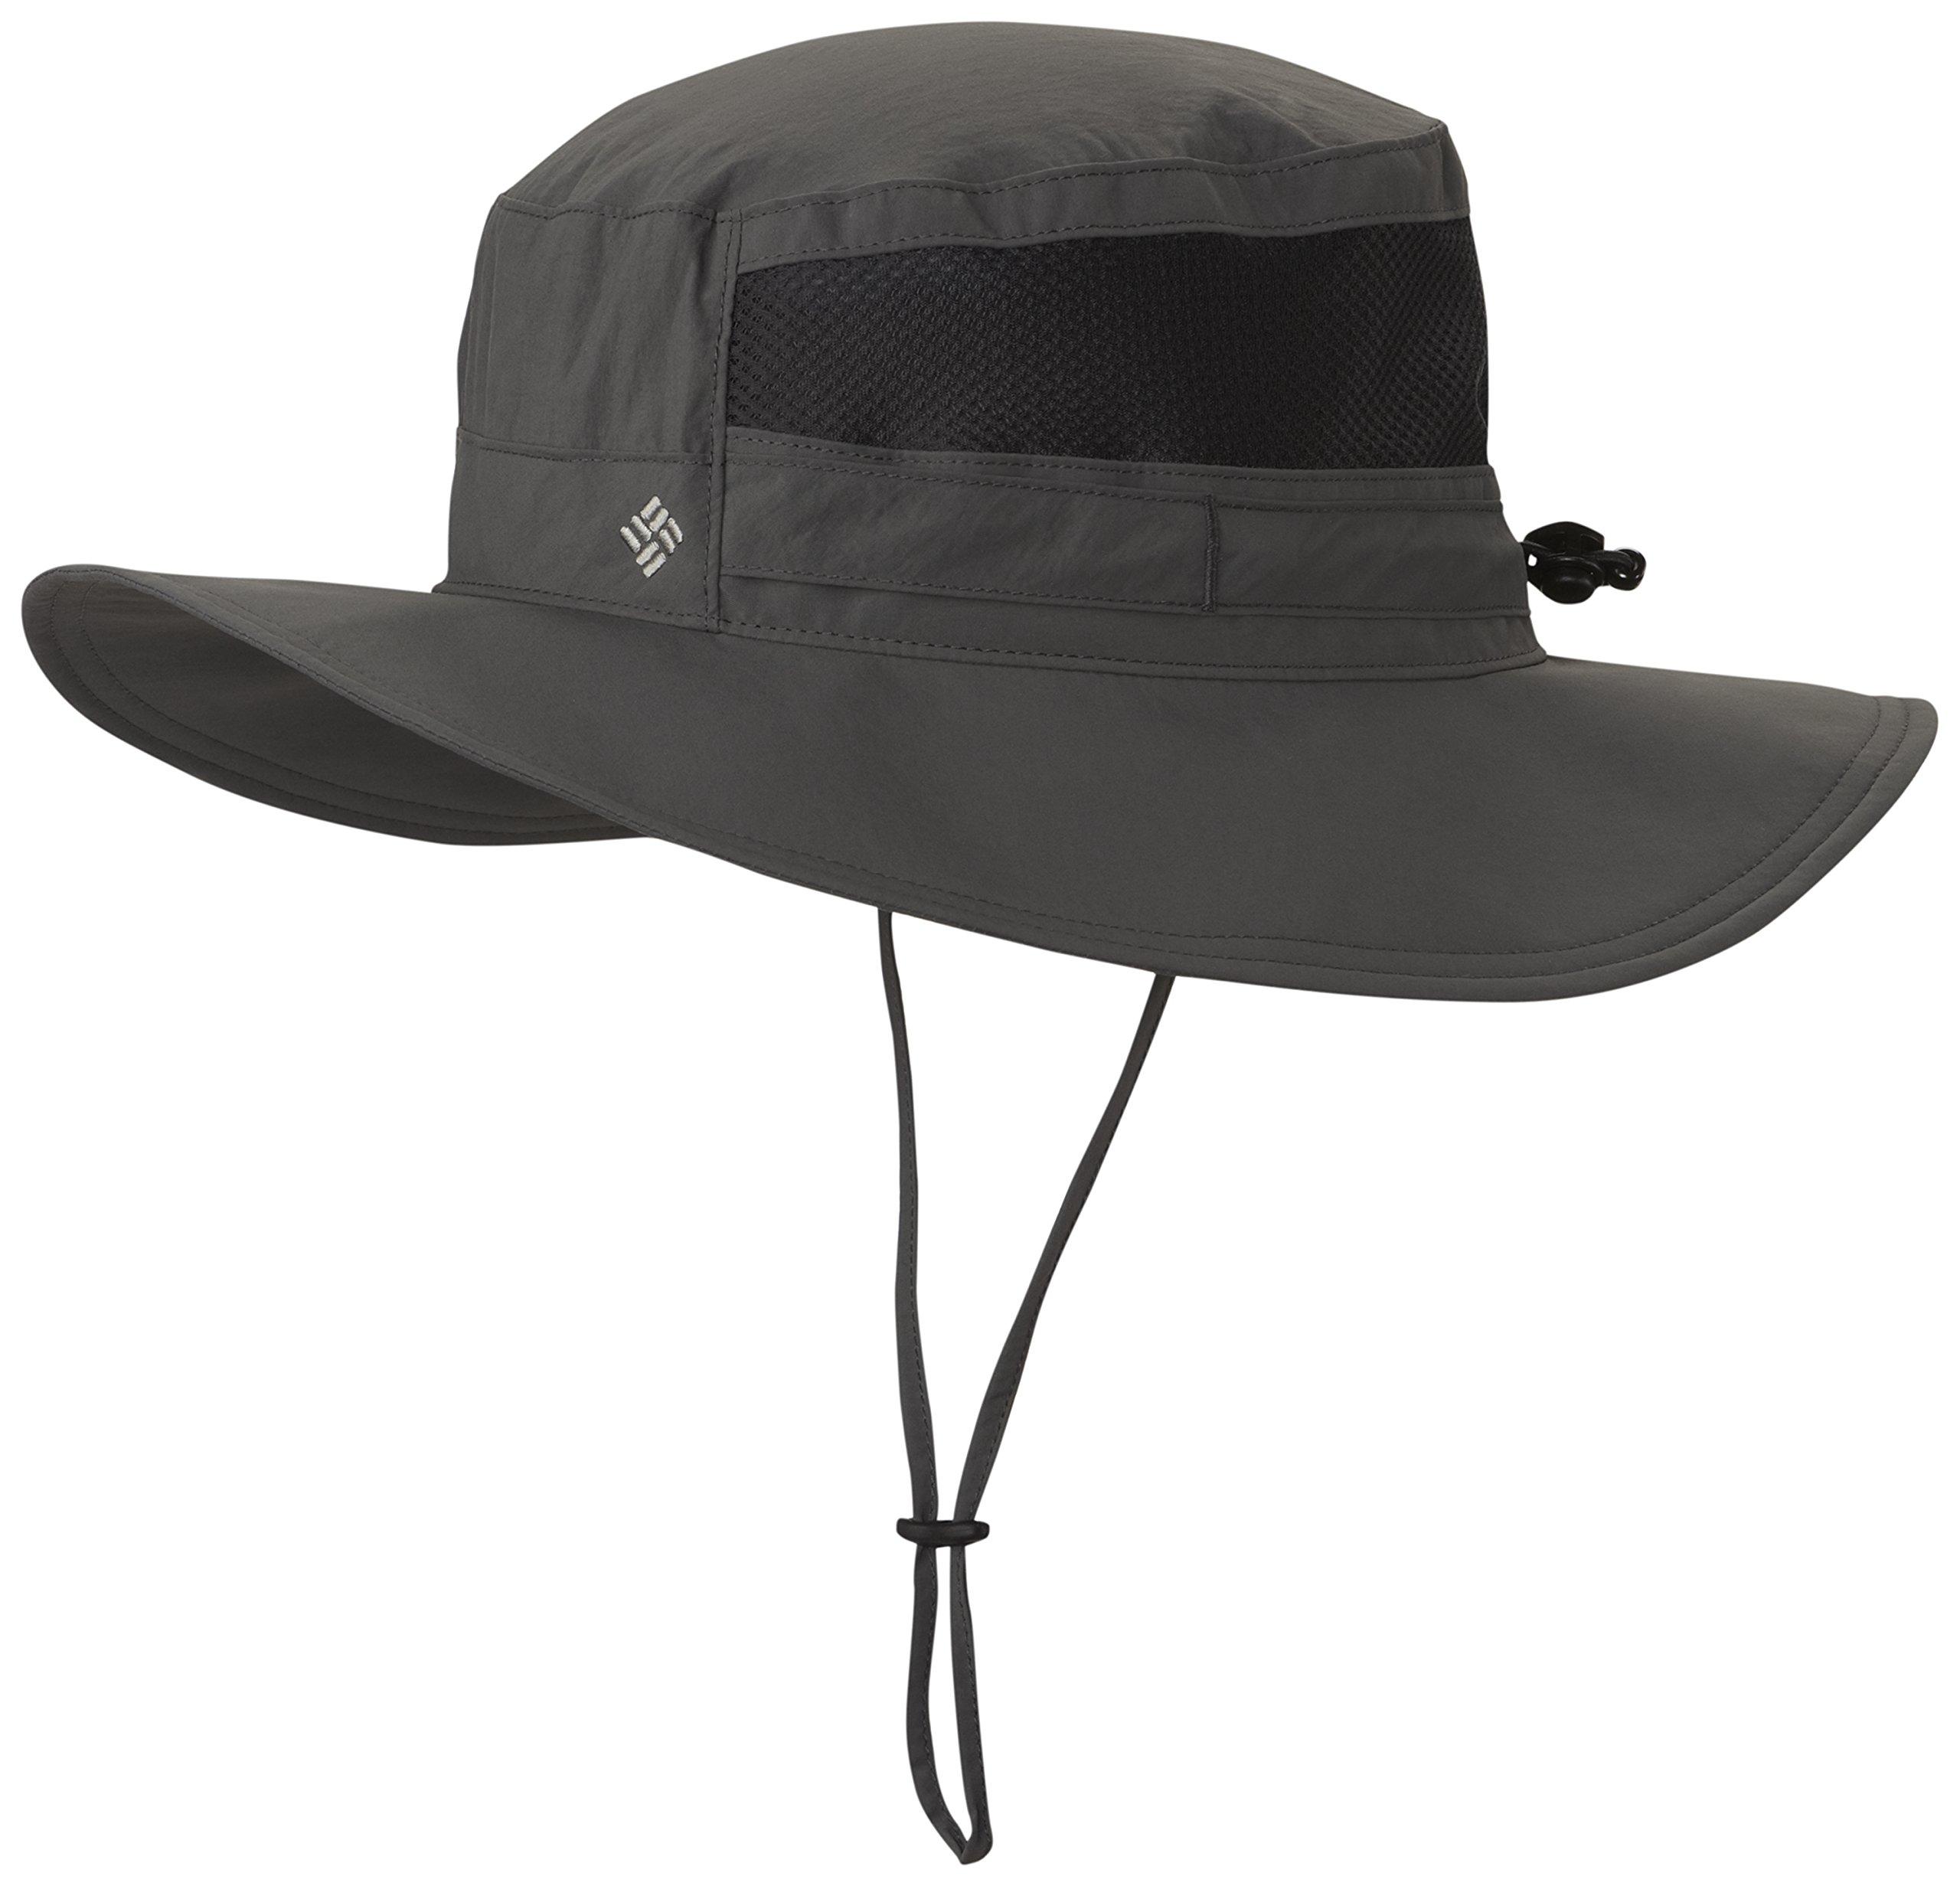 Columbia Unisex Bora Bora II Booney Hat, Moisture Wicking Fabric, UV Sun Protection, Grill, One Size by Columbia